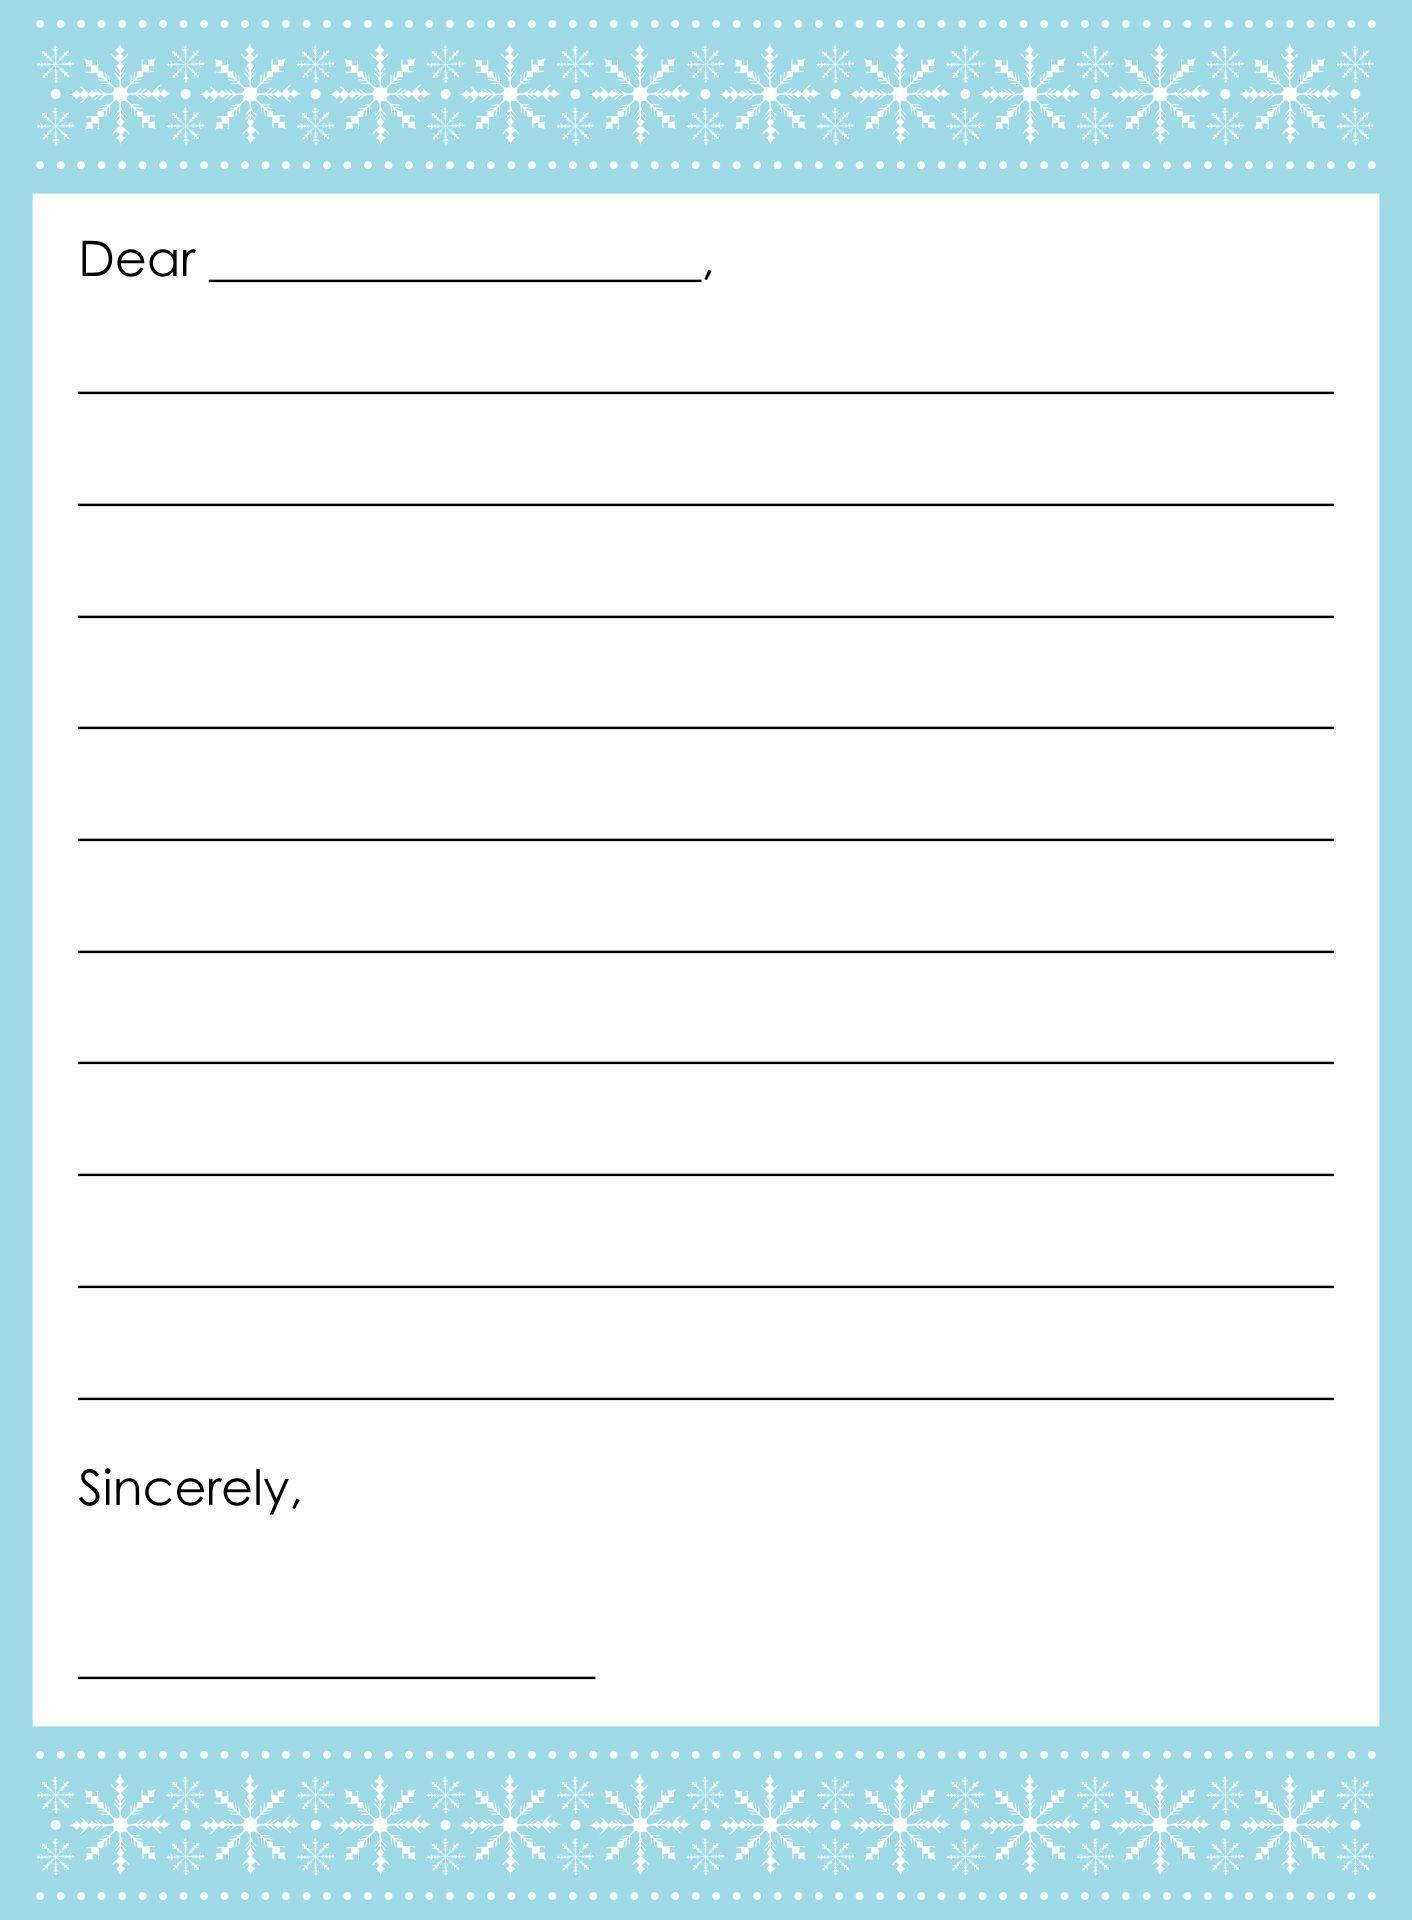 Snowflake Letter Printable Template